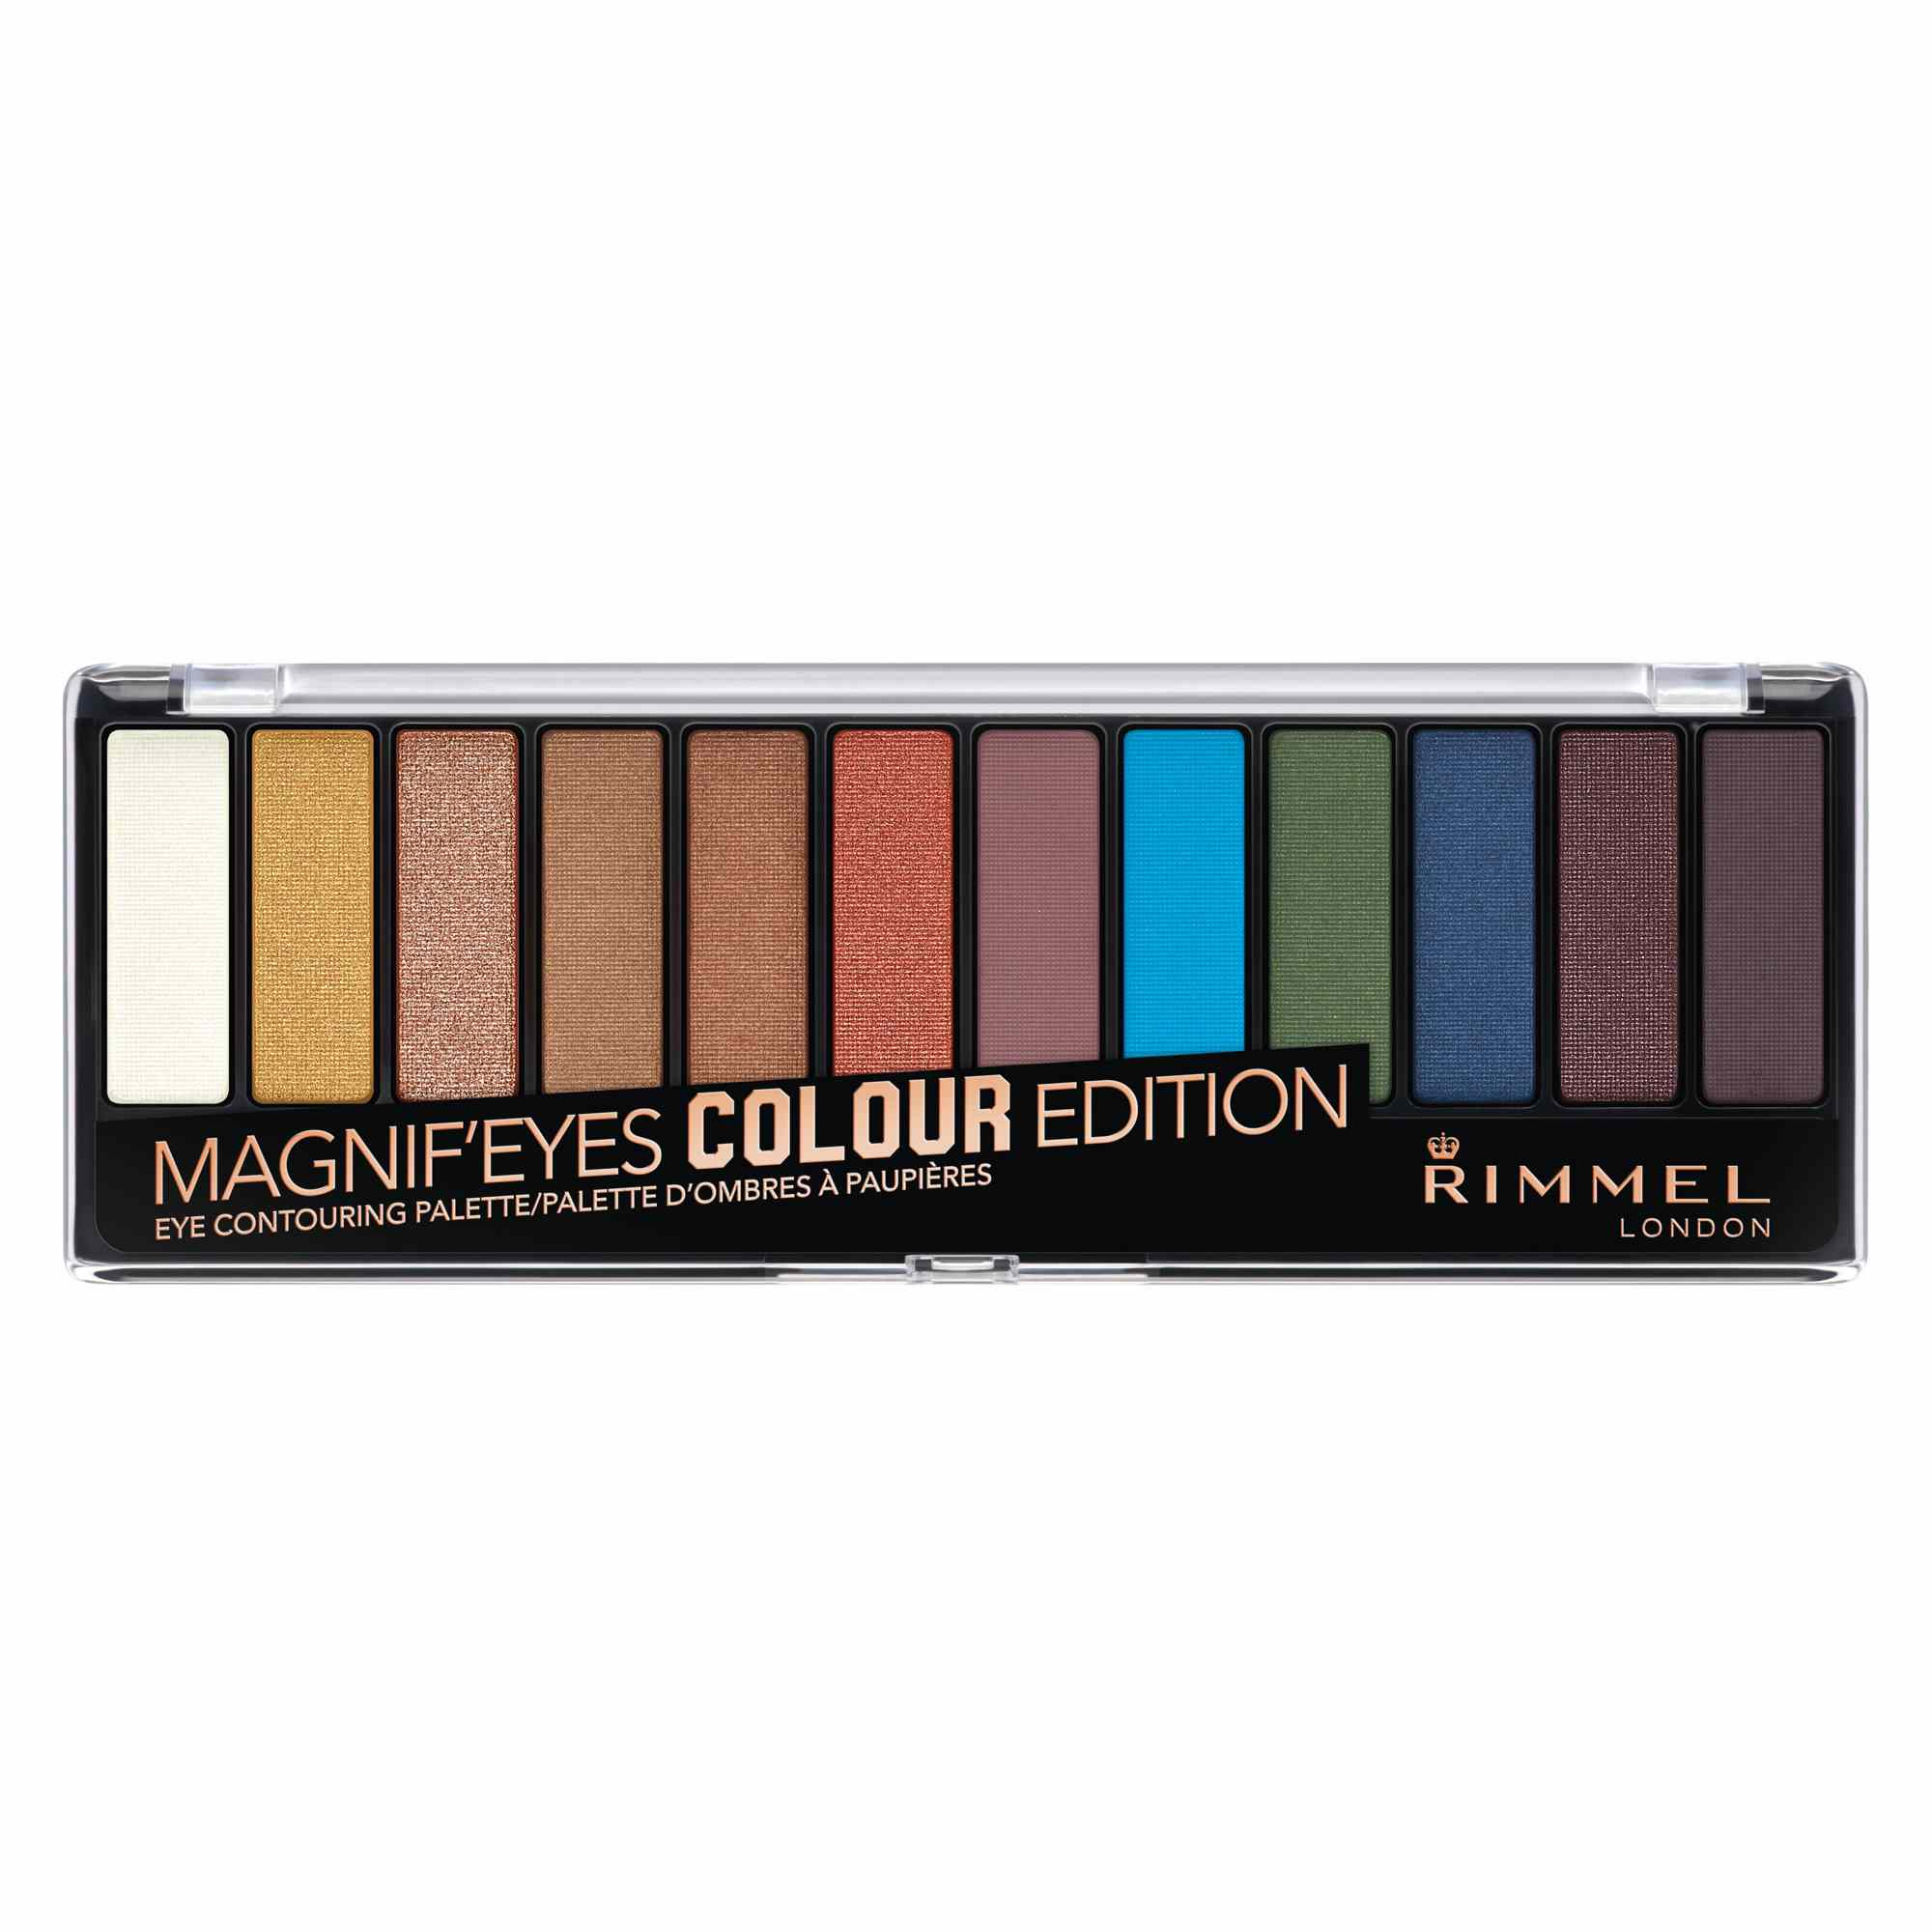 Rimmel London Magnif'eyes Colour Edition Eyeshadow Palette